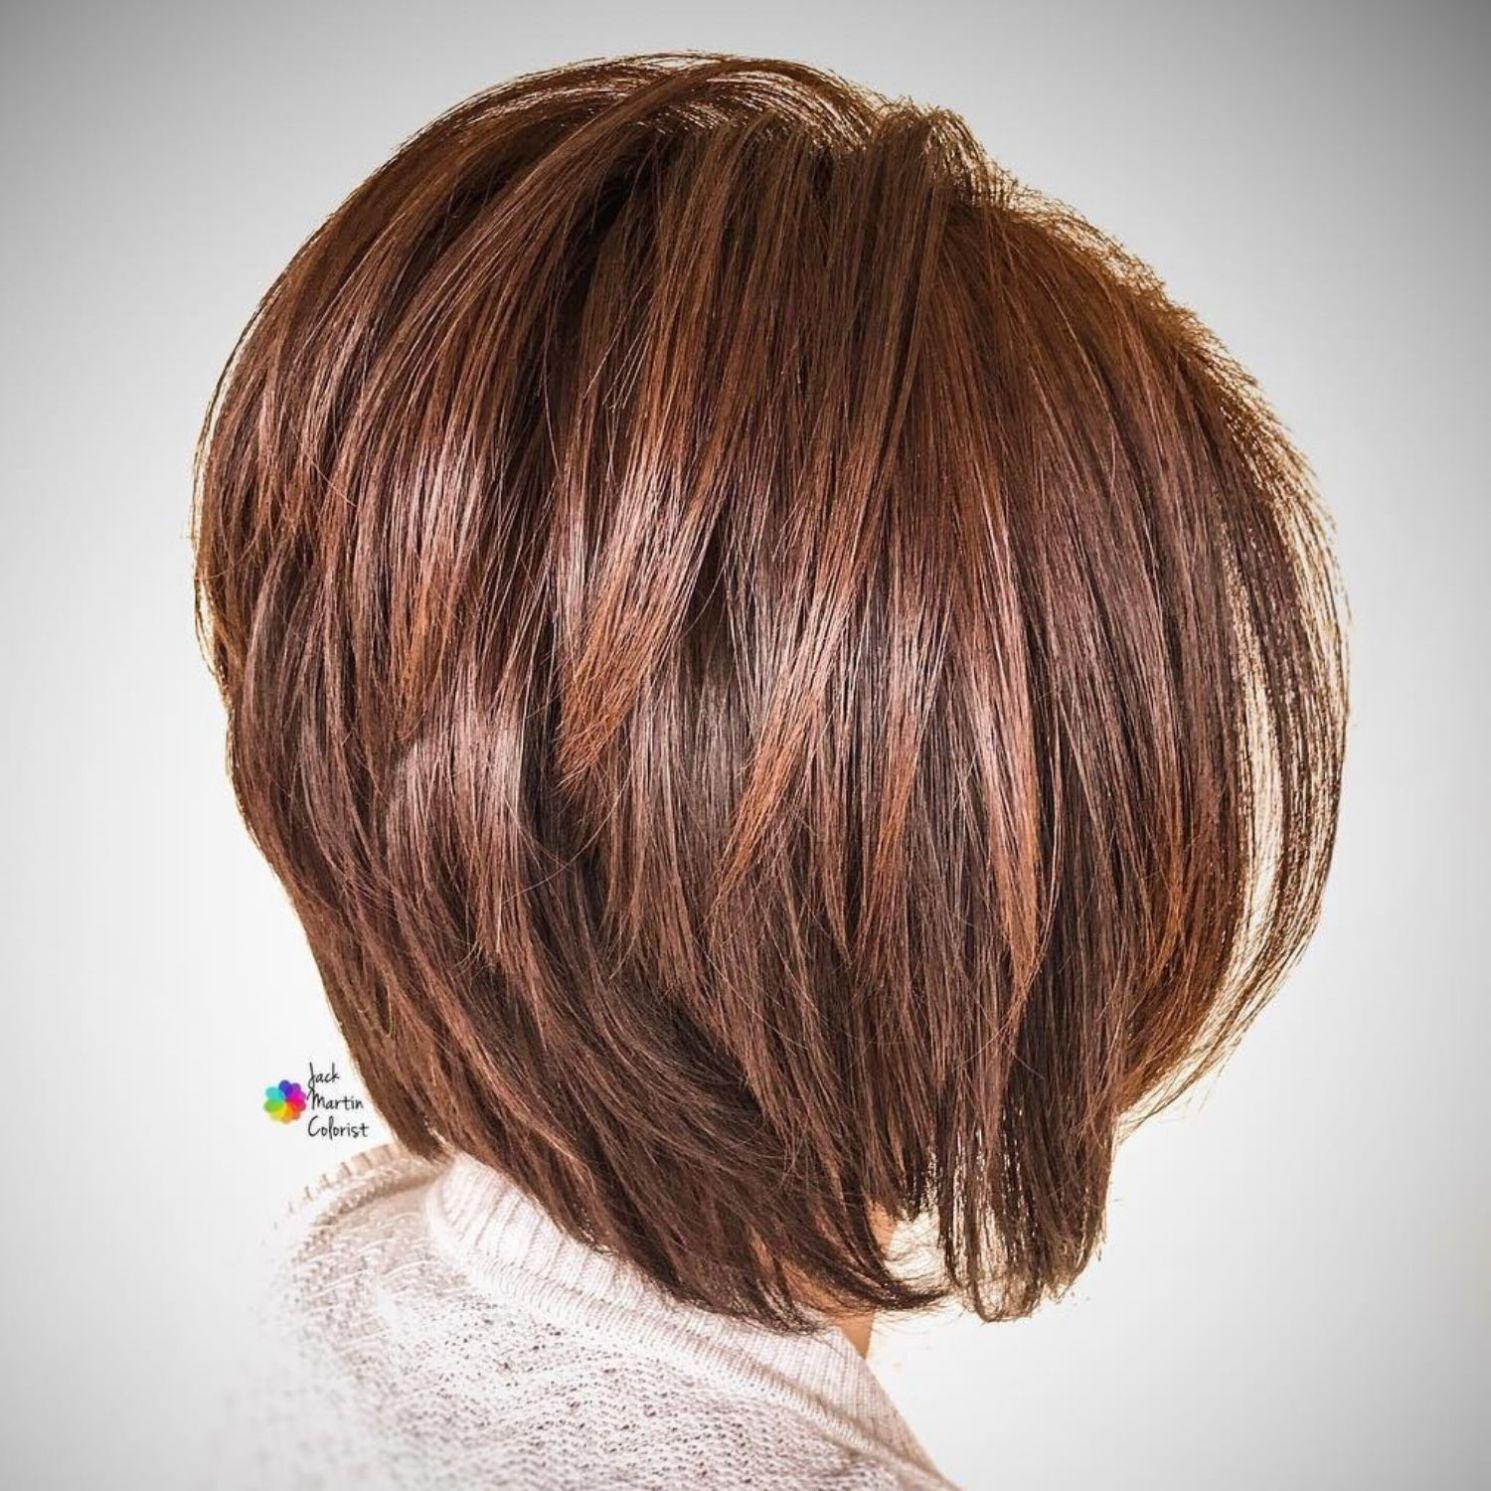 60 Beautiful and Convenient Medium Bob Hairstyles